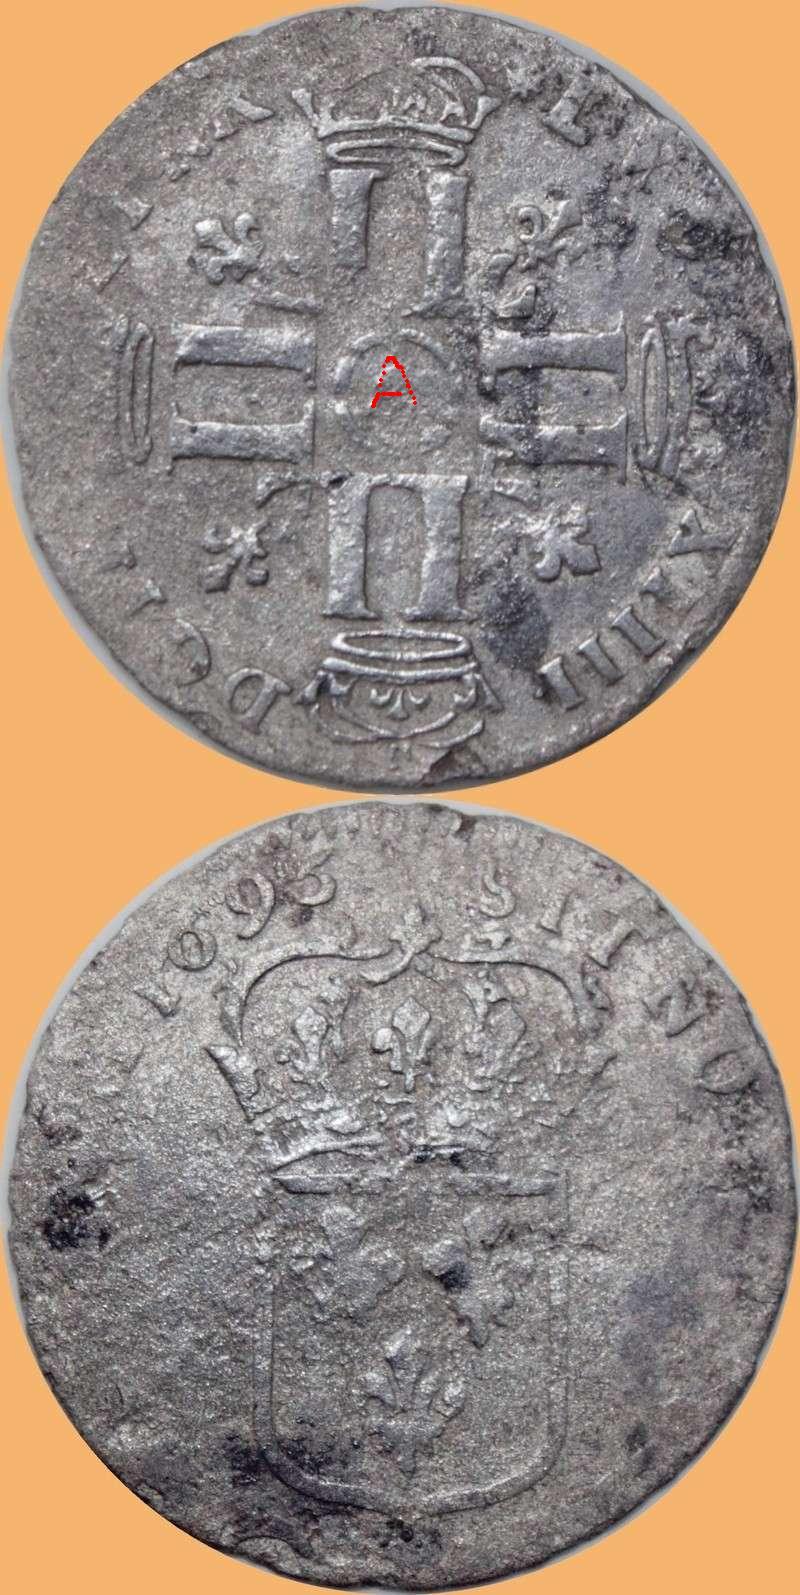 QUINZAIN LOUIS XIIII 1695. MAIS QUEL ATELIER? Louis_10